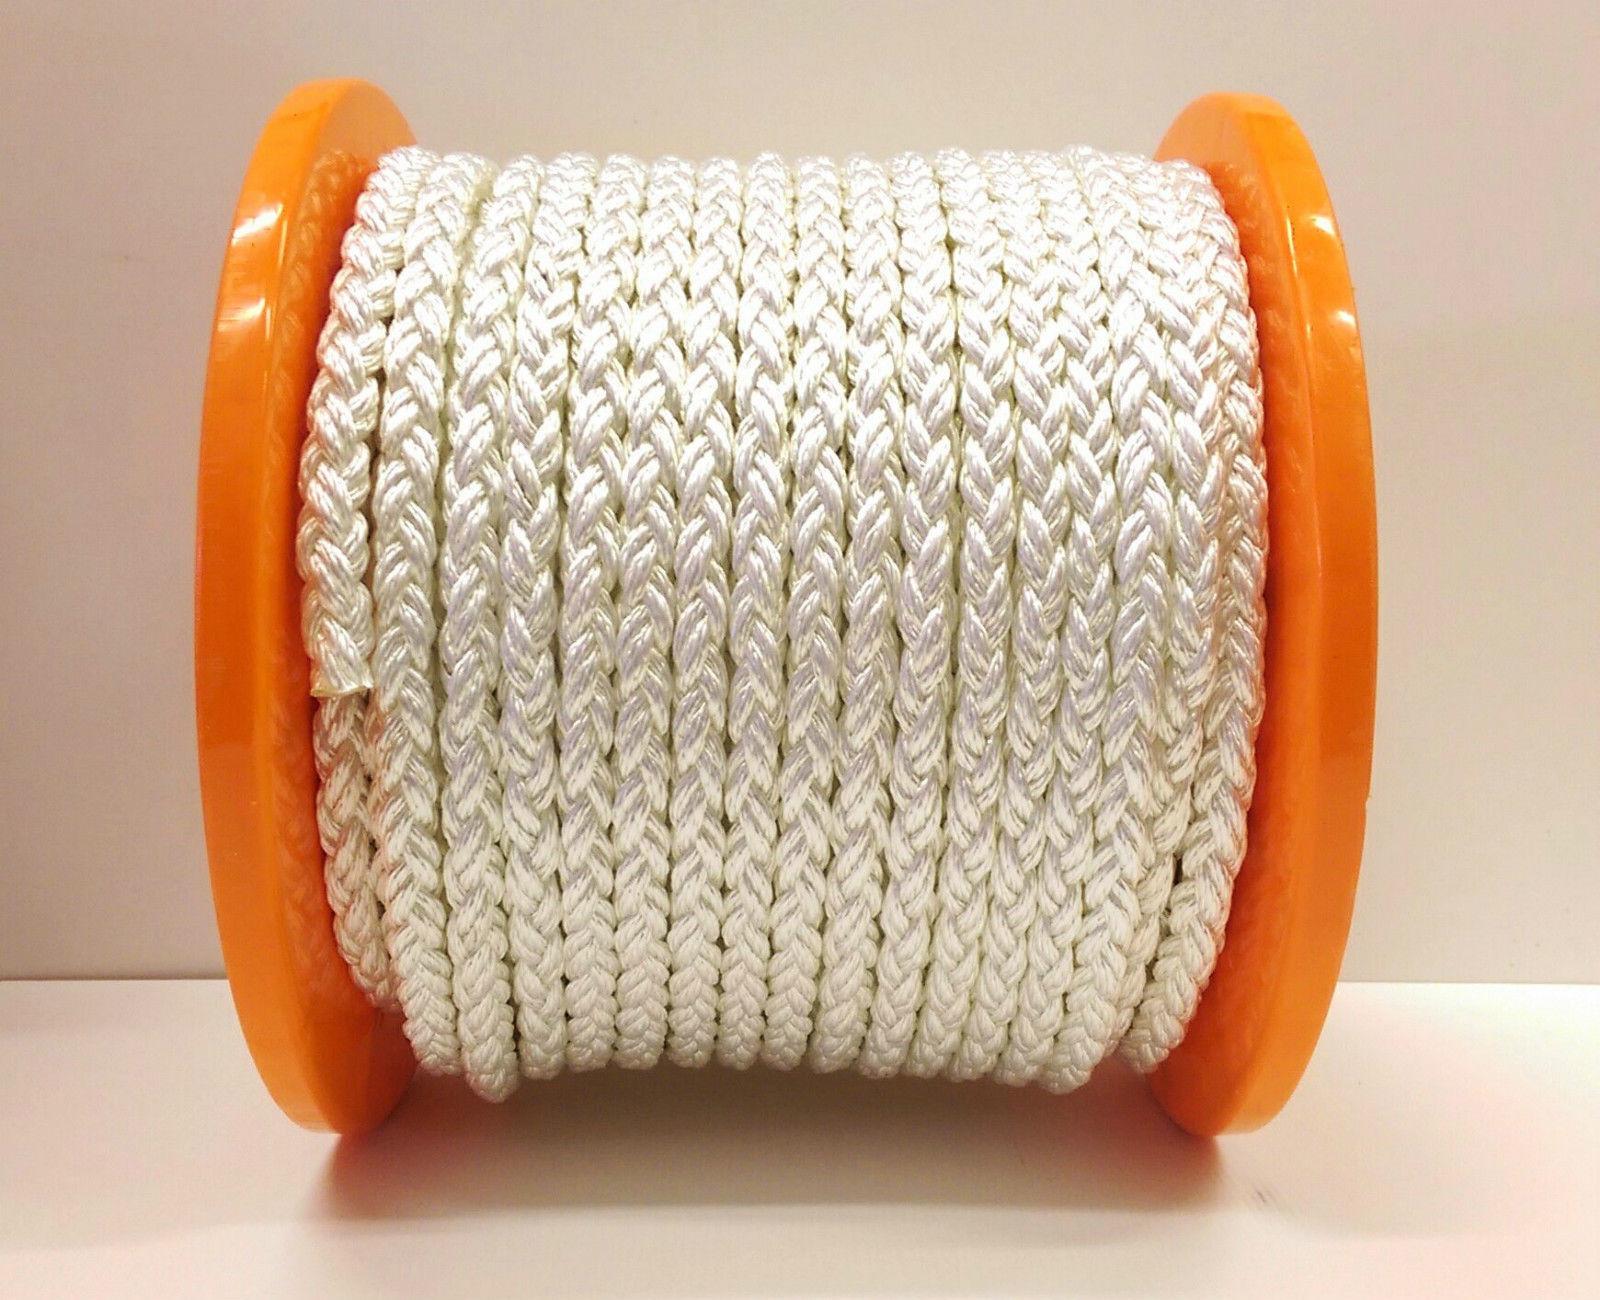 8plait Multiplait Octoplait Polyester Anchor Mooring Rope 100mt Reels 14,16,18mm